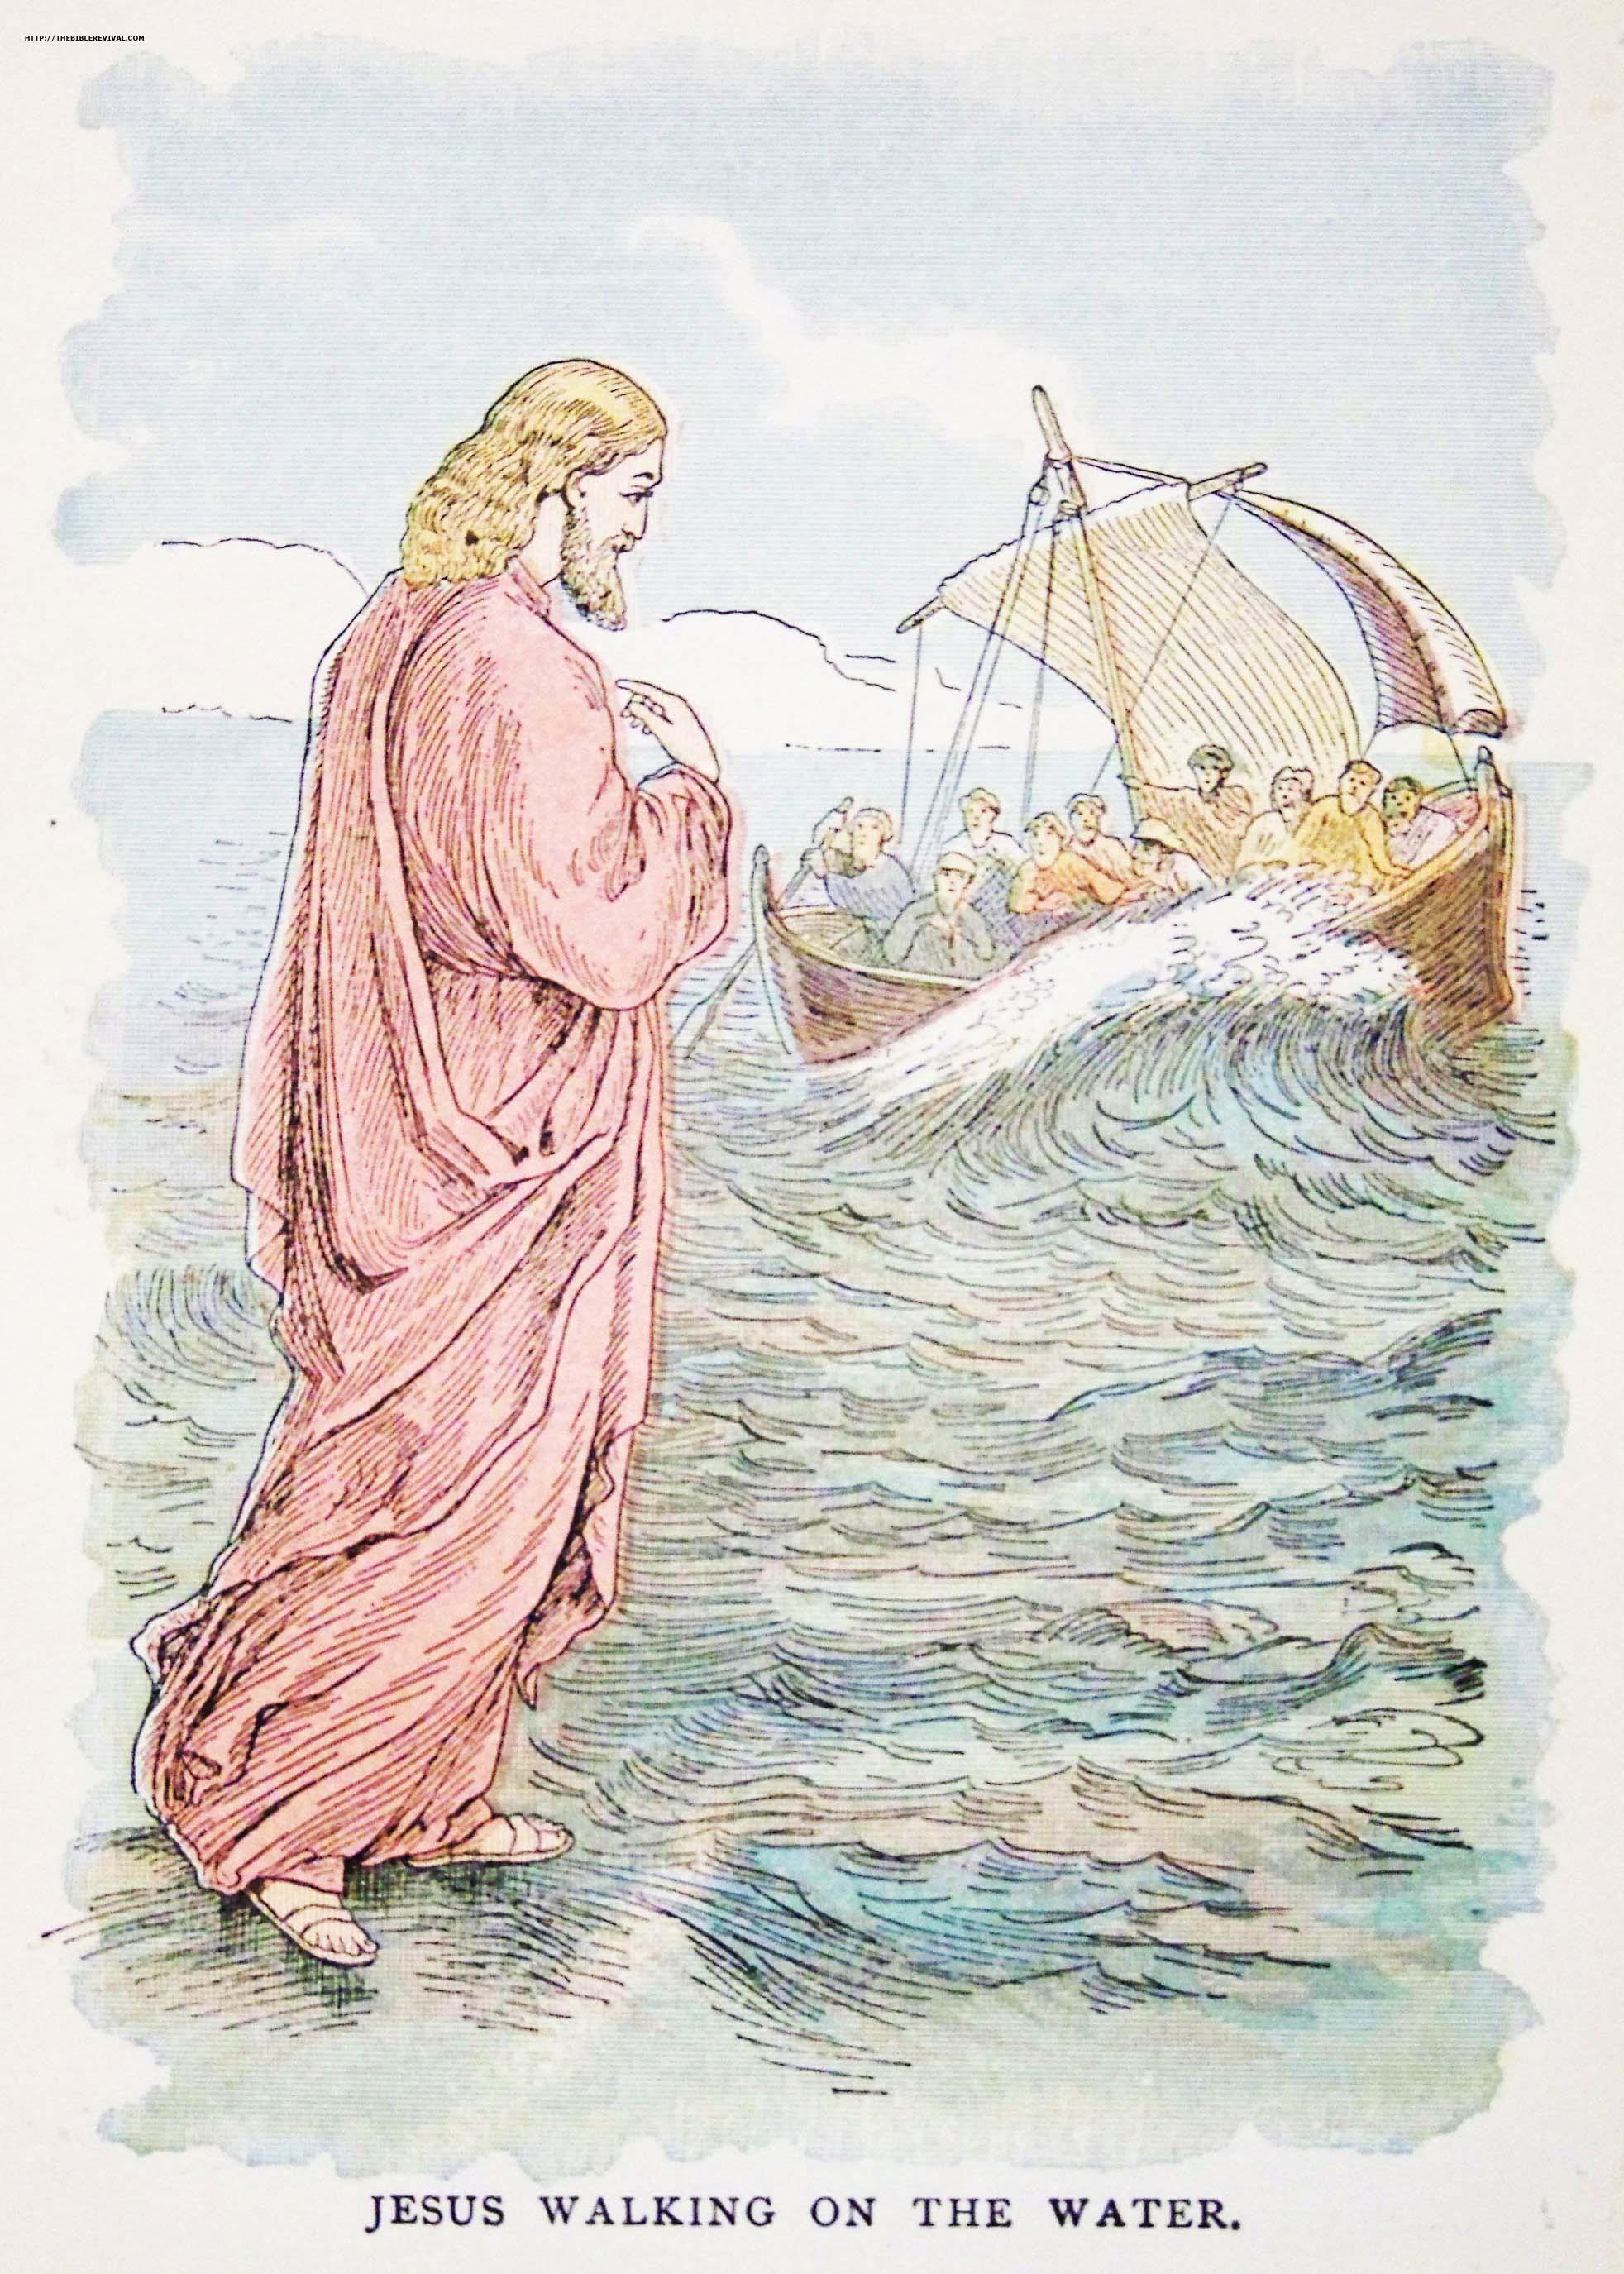 Mark 6-50 jesuswalkingonthewater